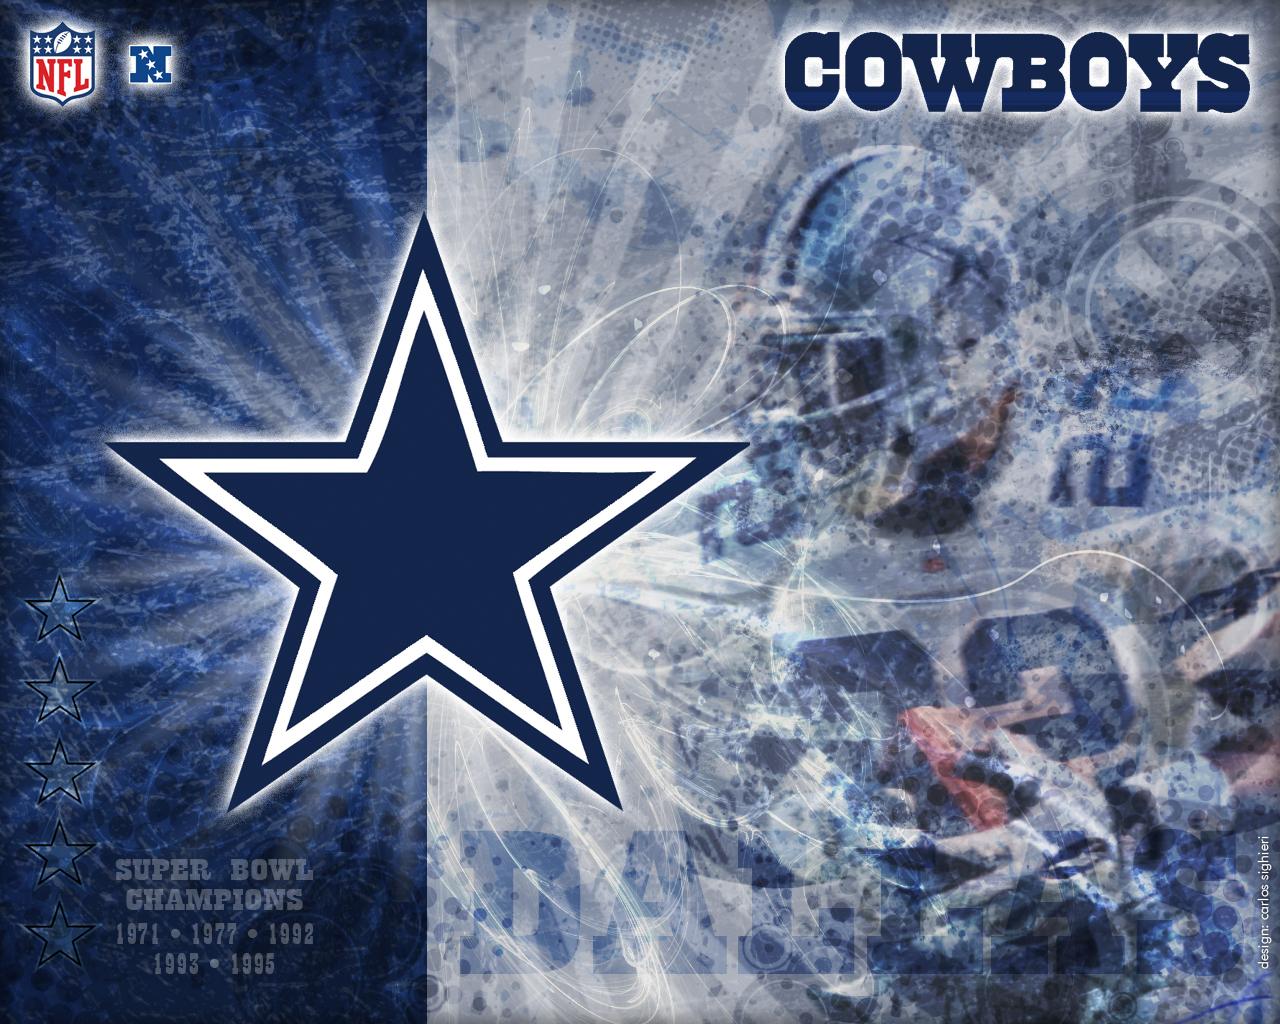 Dallas Cowboys wallpaper HD images Dallas Cowboys wallpapers 1280x1024